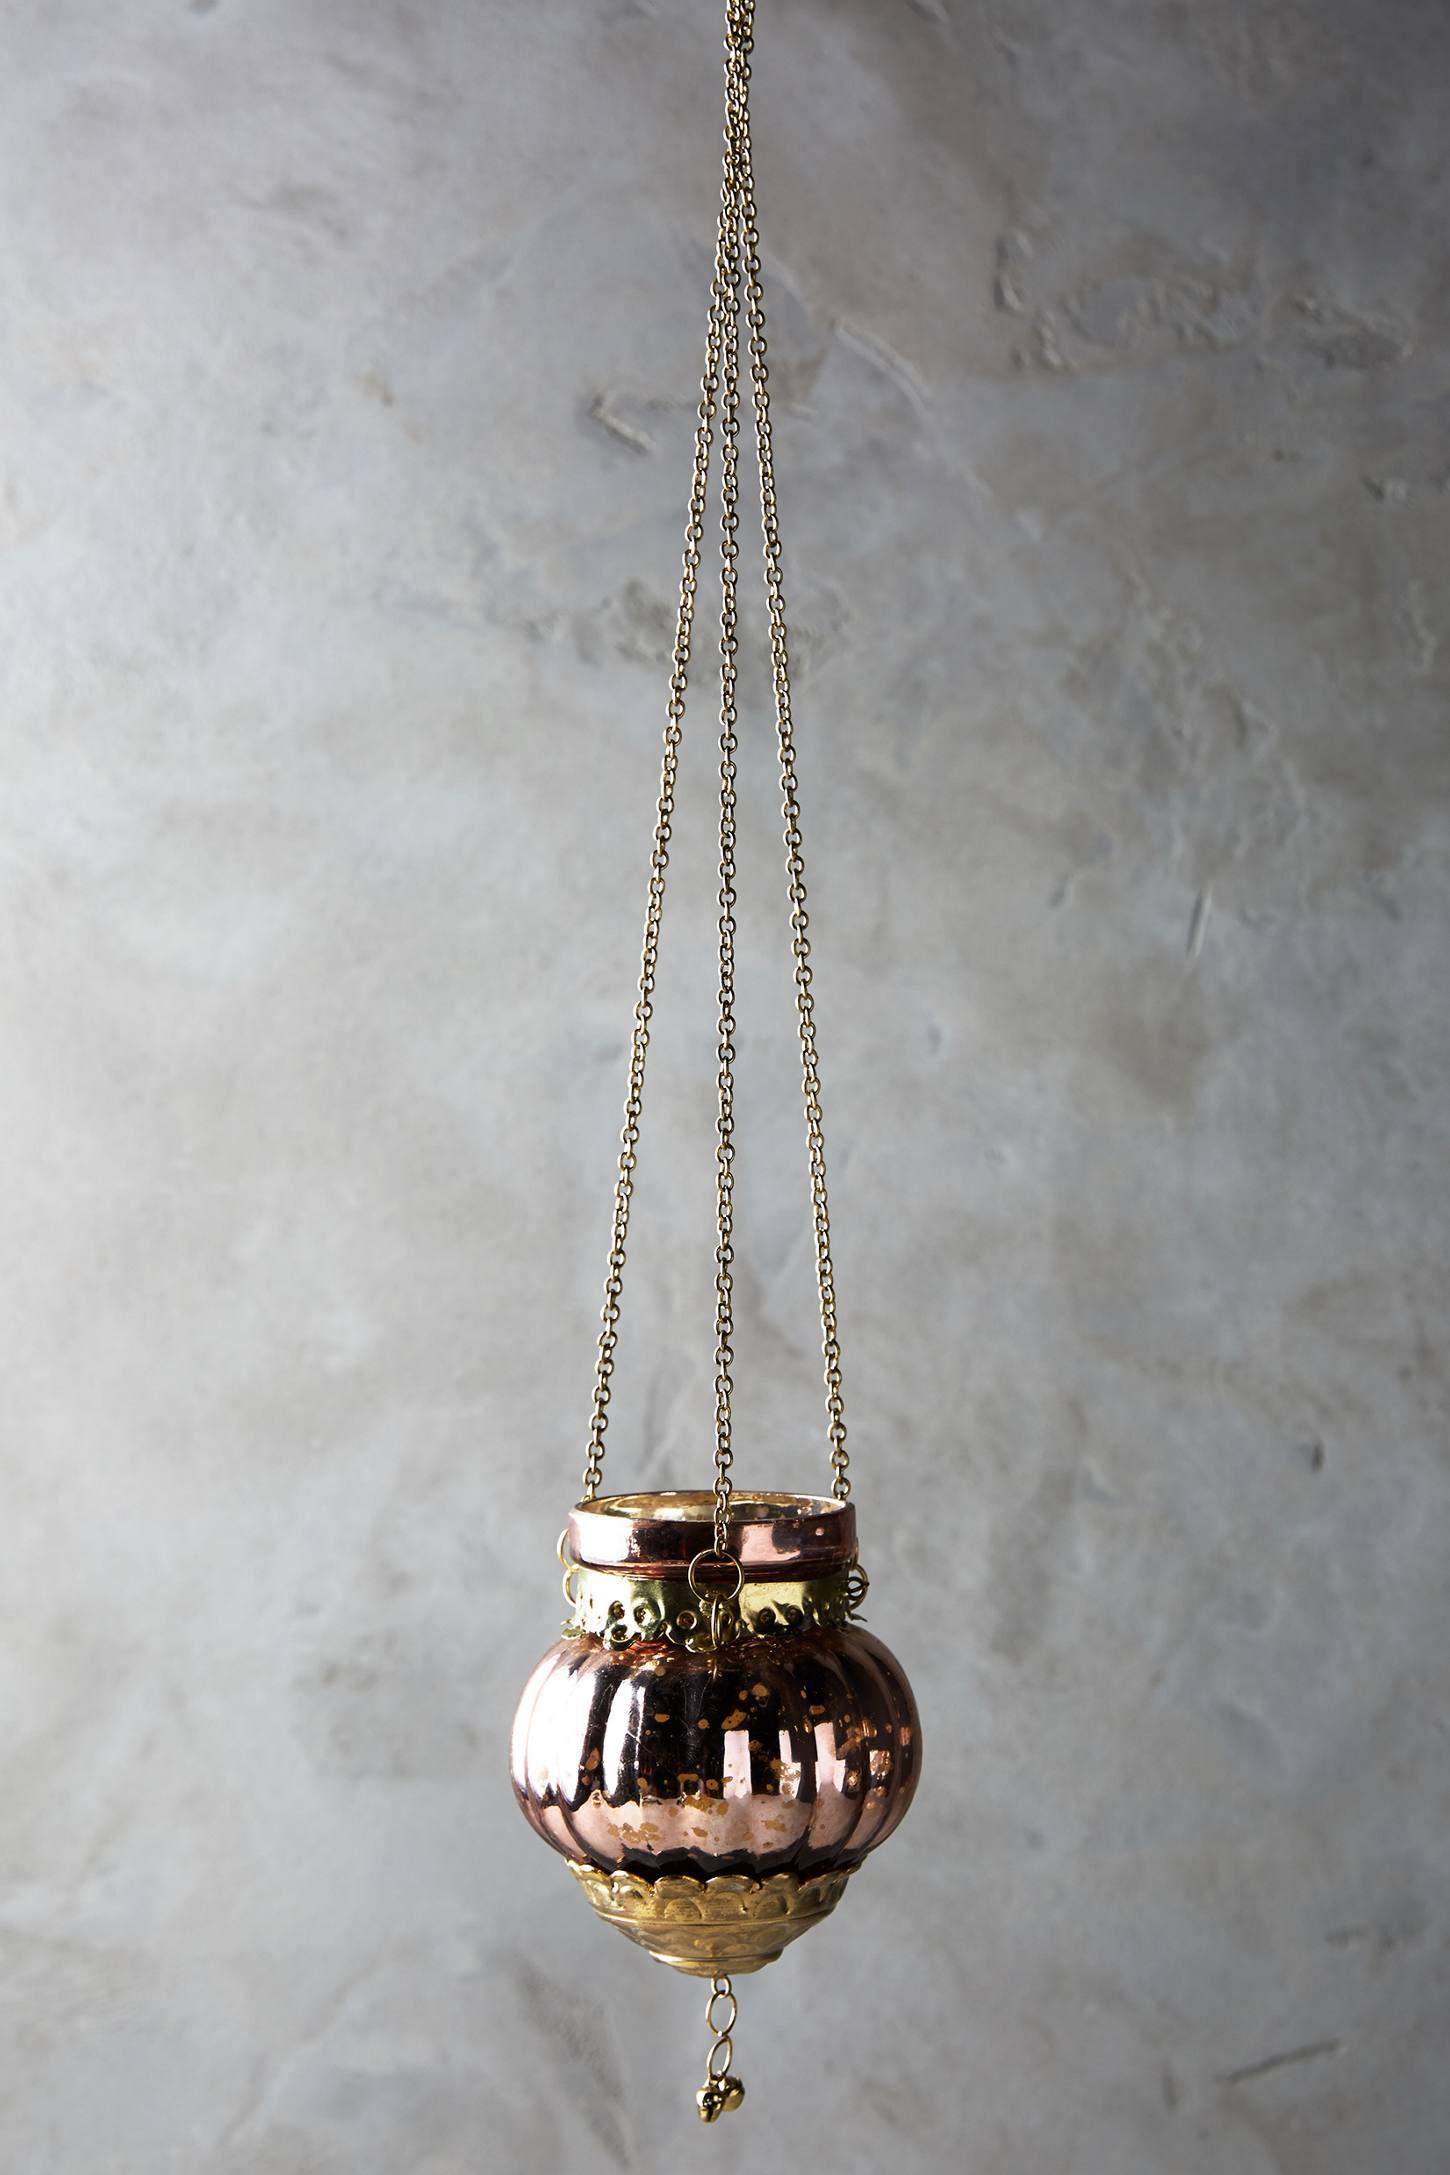 Evensong Lantern